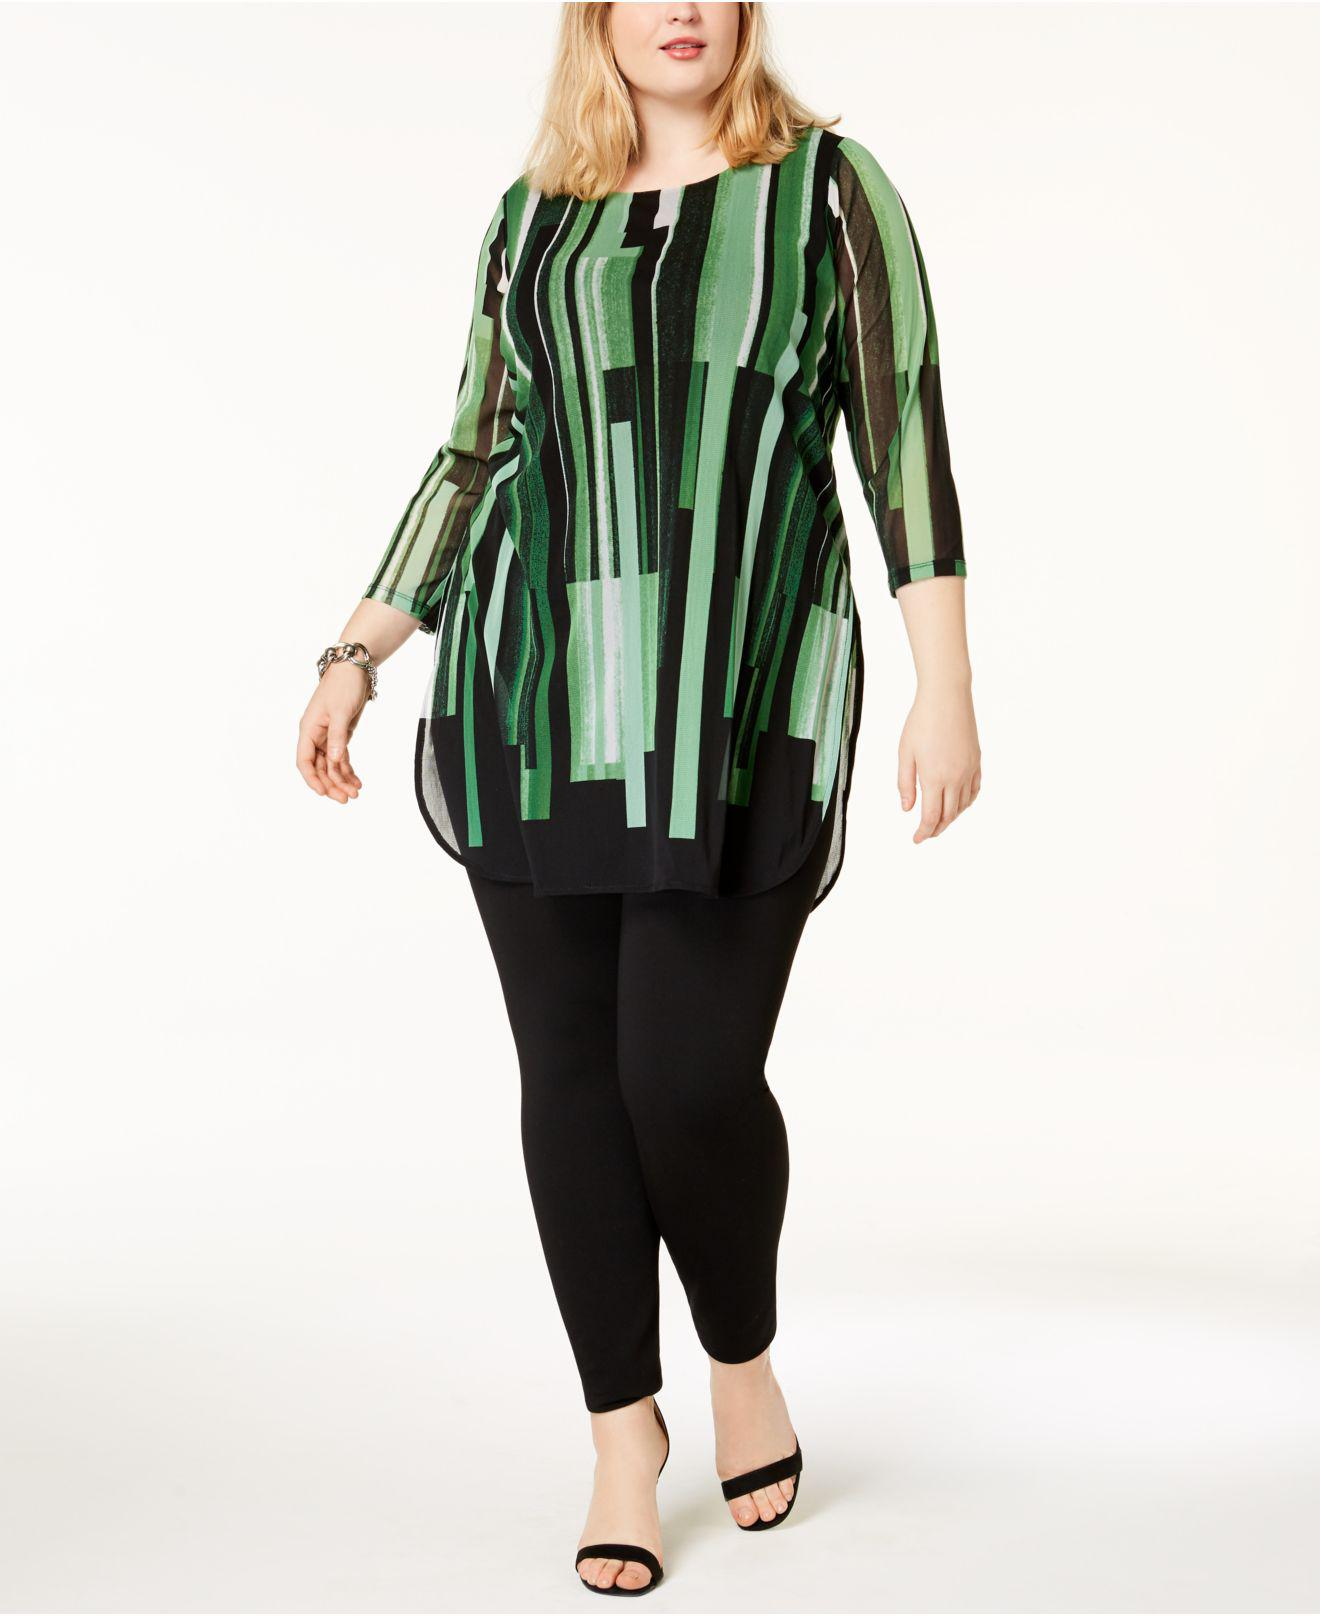 9d268102292 Plus Size Long Tunic Tops For Leggings